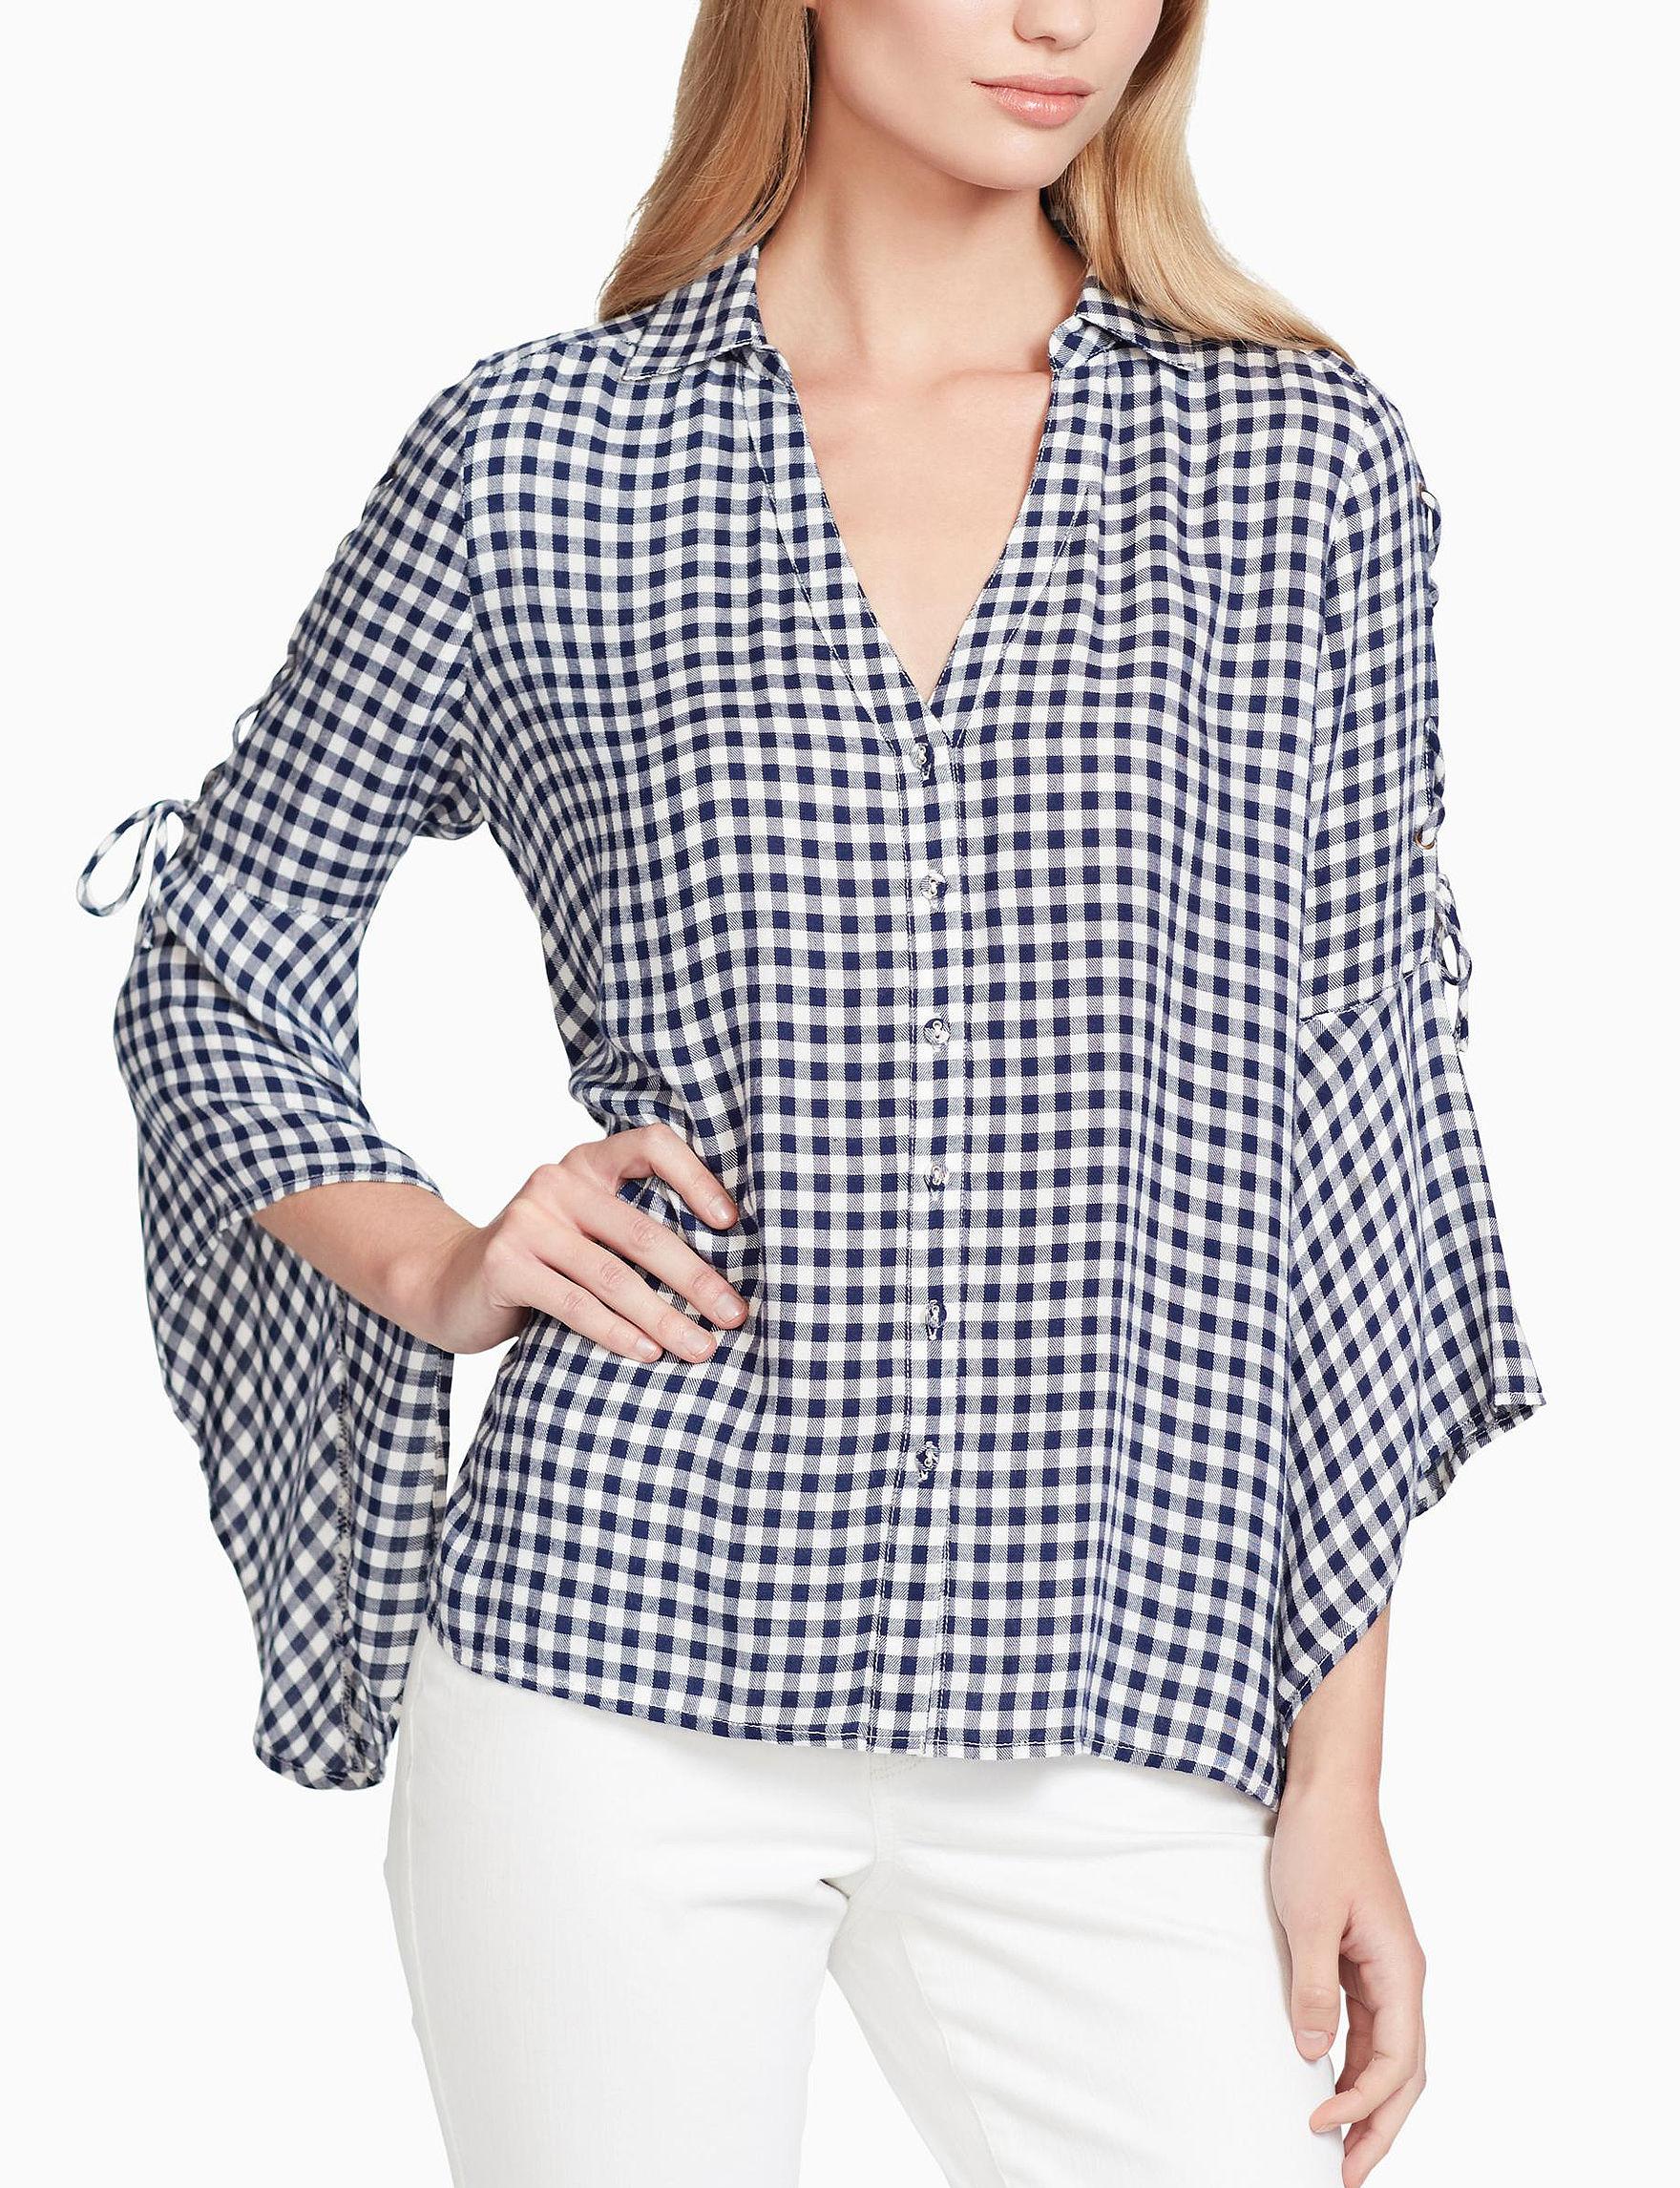 Jessica Simpson Blue / White Shirts & Blouses